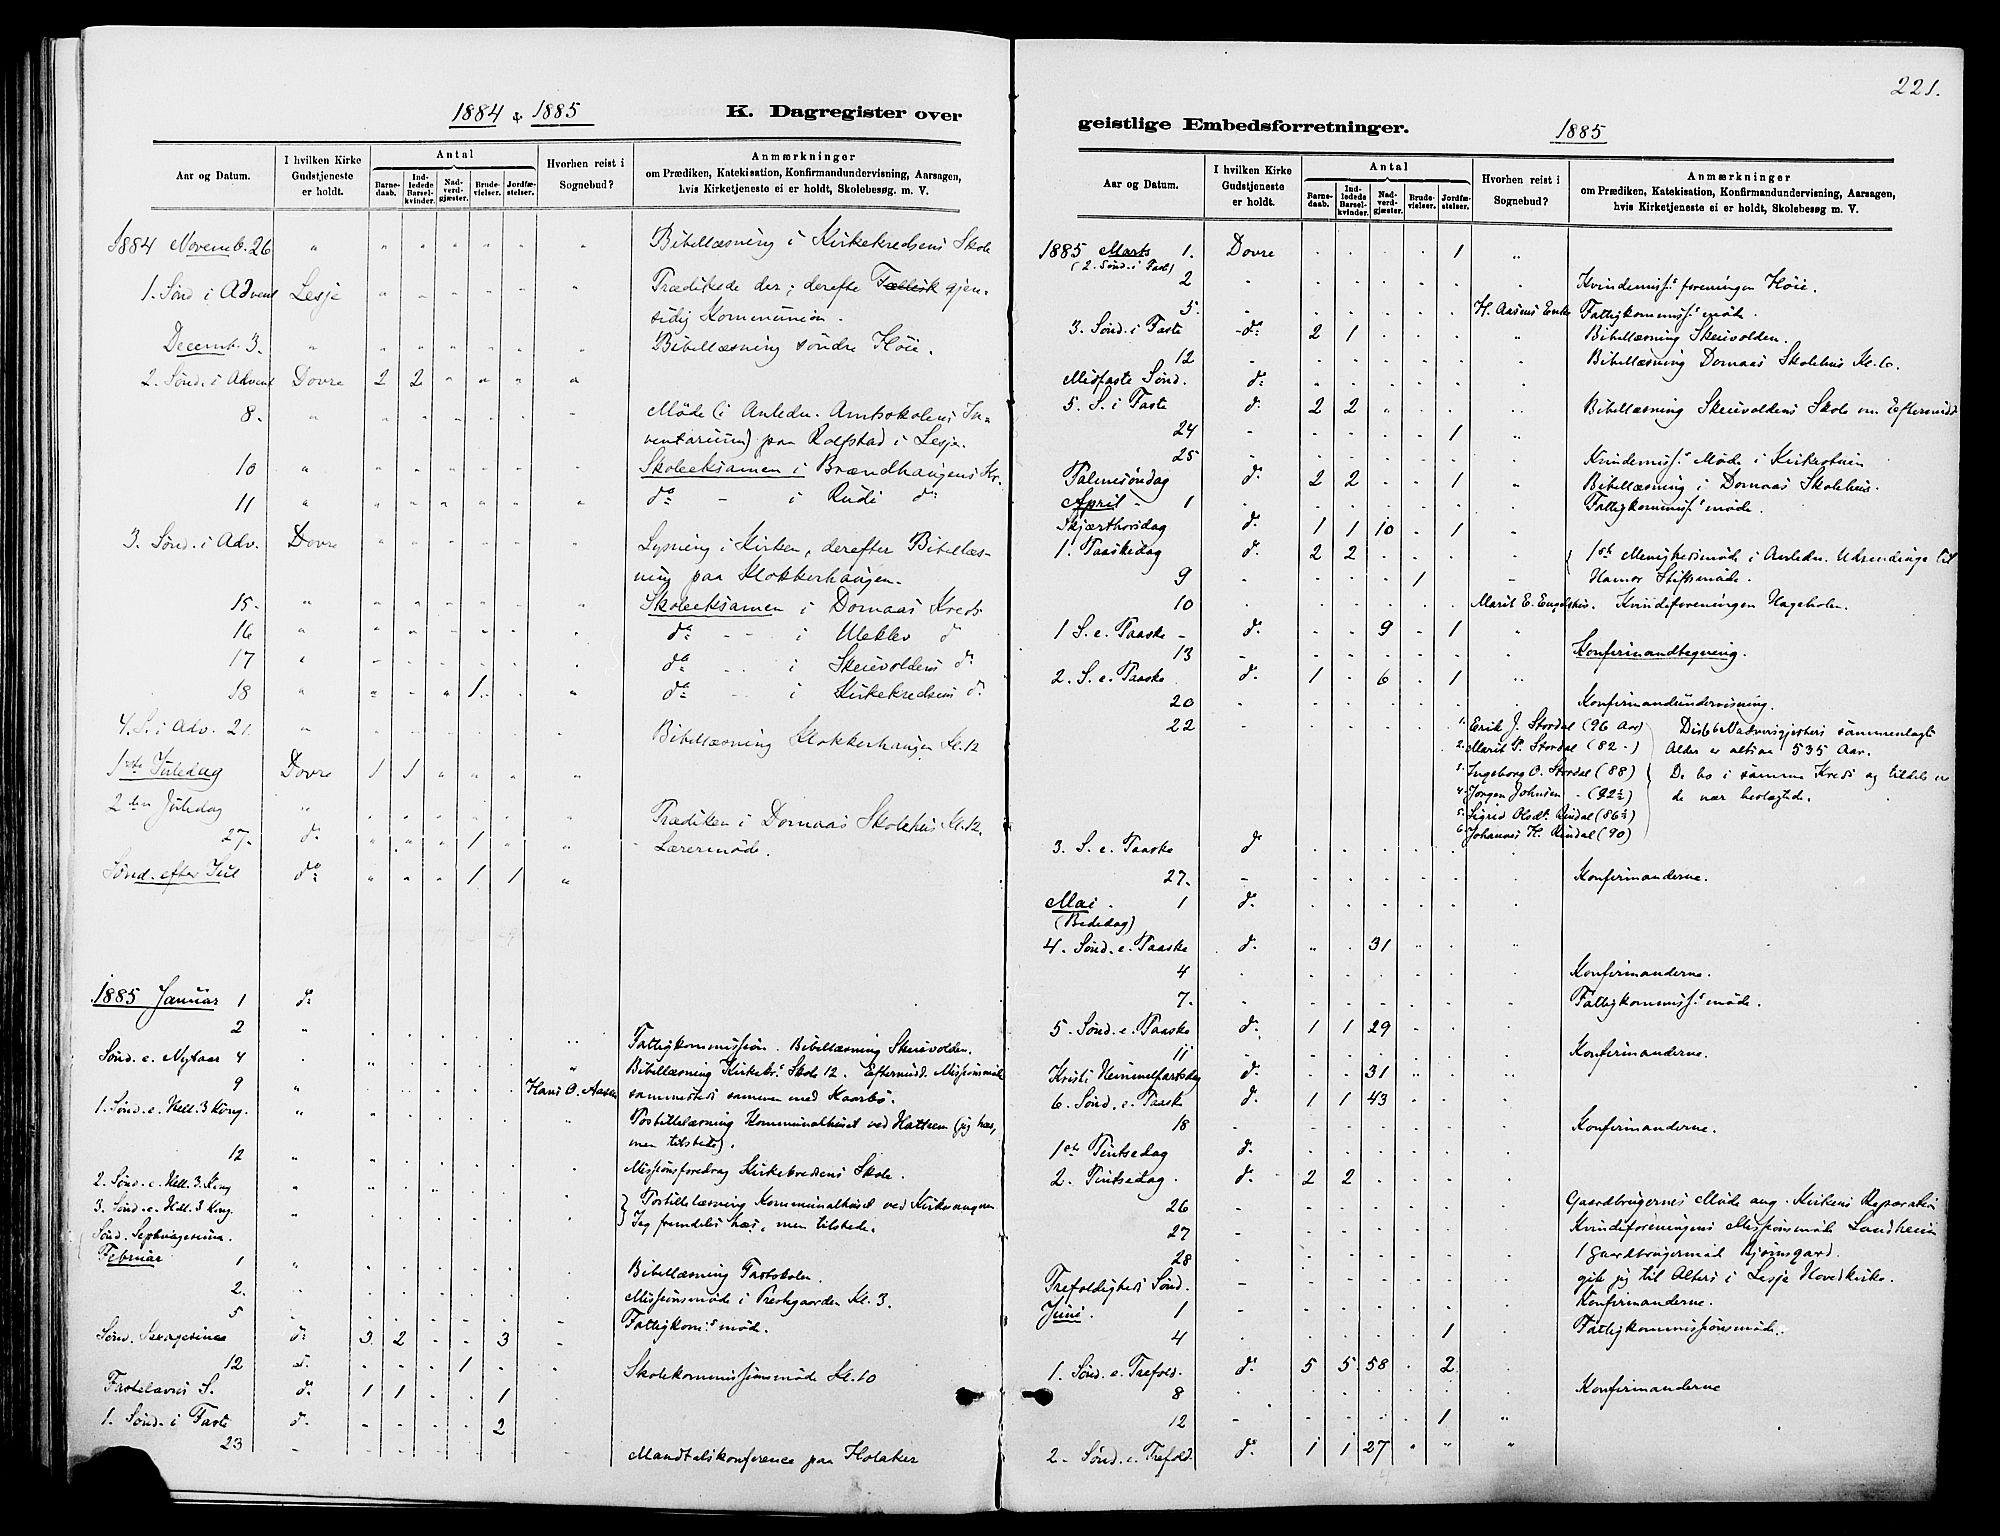 SAH, Dovre prestekontor, Ministerialbok nr. 2, 1879-1890, s. 221